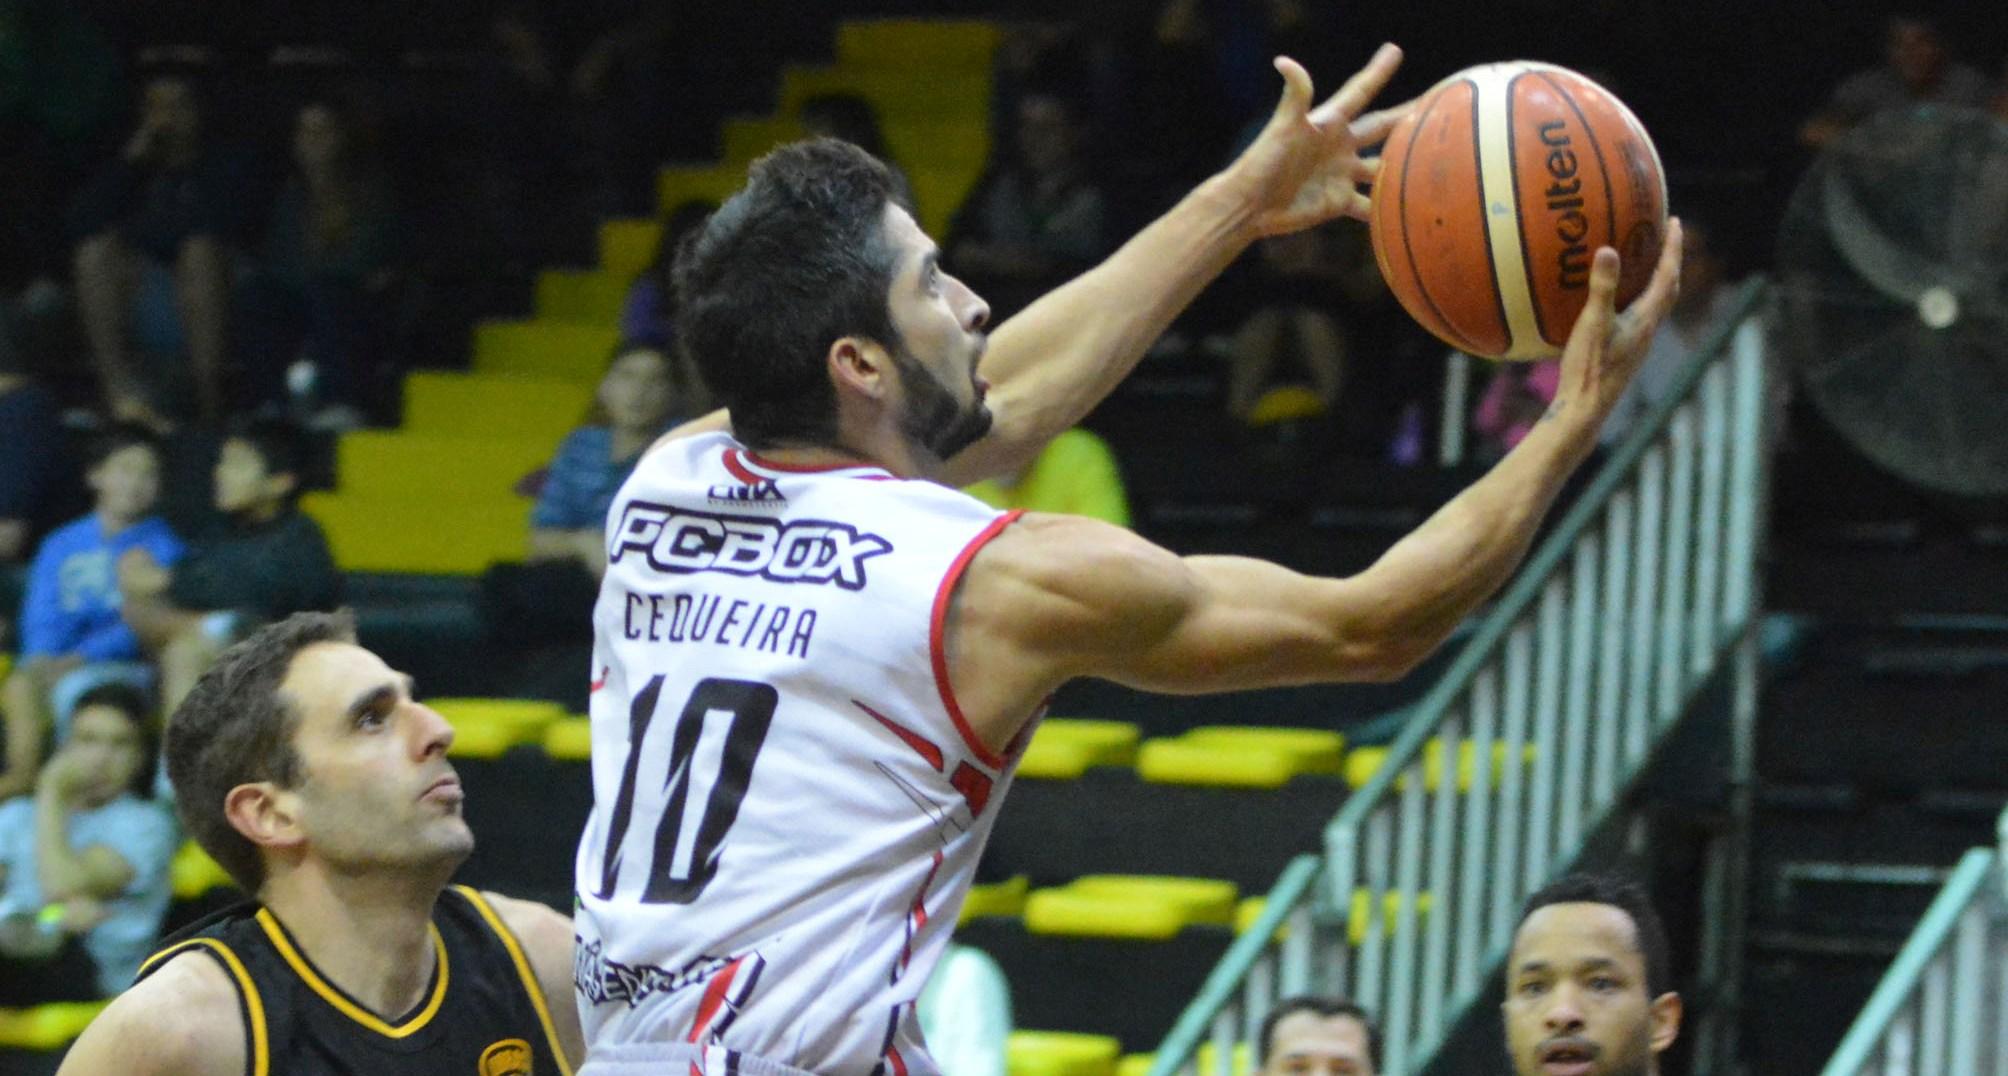 Luis Cequeira ensaya la bandeja ante la mirada de Juan Gutiérrez. (Foto: LNB.com.ar)